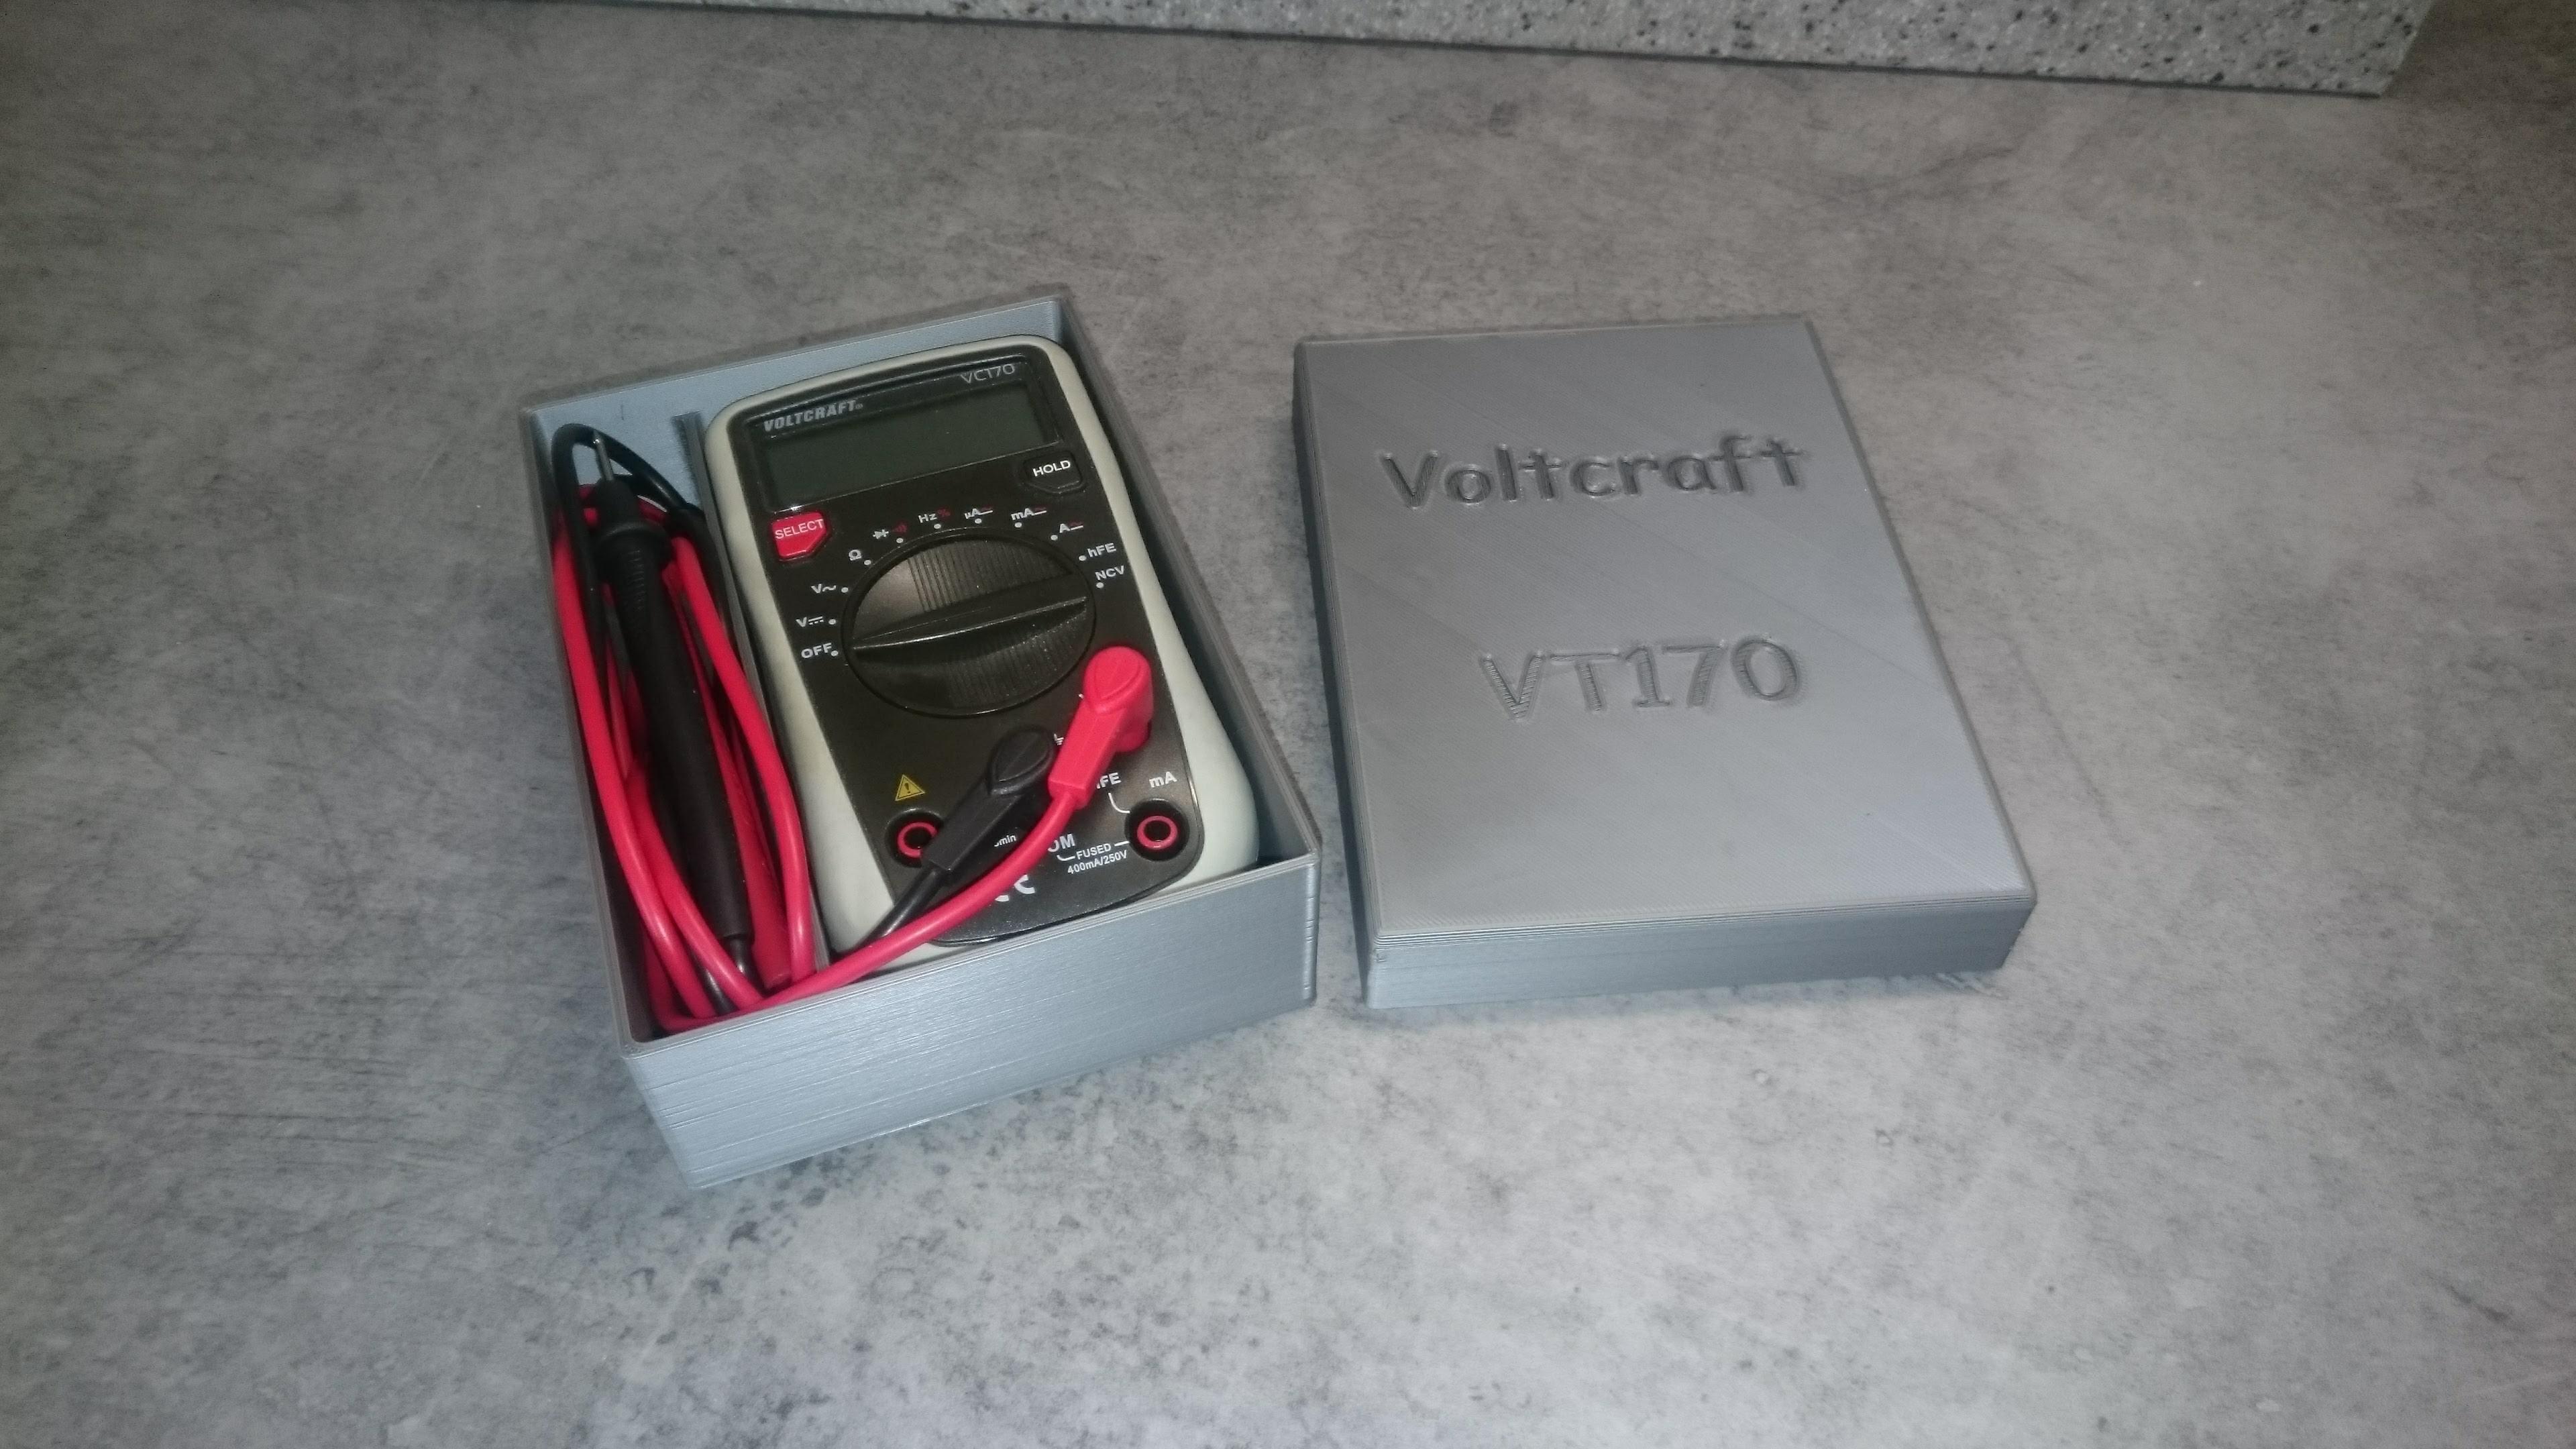 Voltcraft VC170 02.jpg Download free STL file Box for Voltmeter • 3D print template, Ldom21